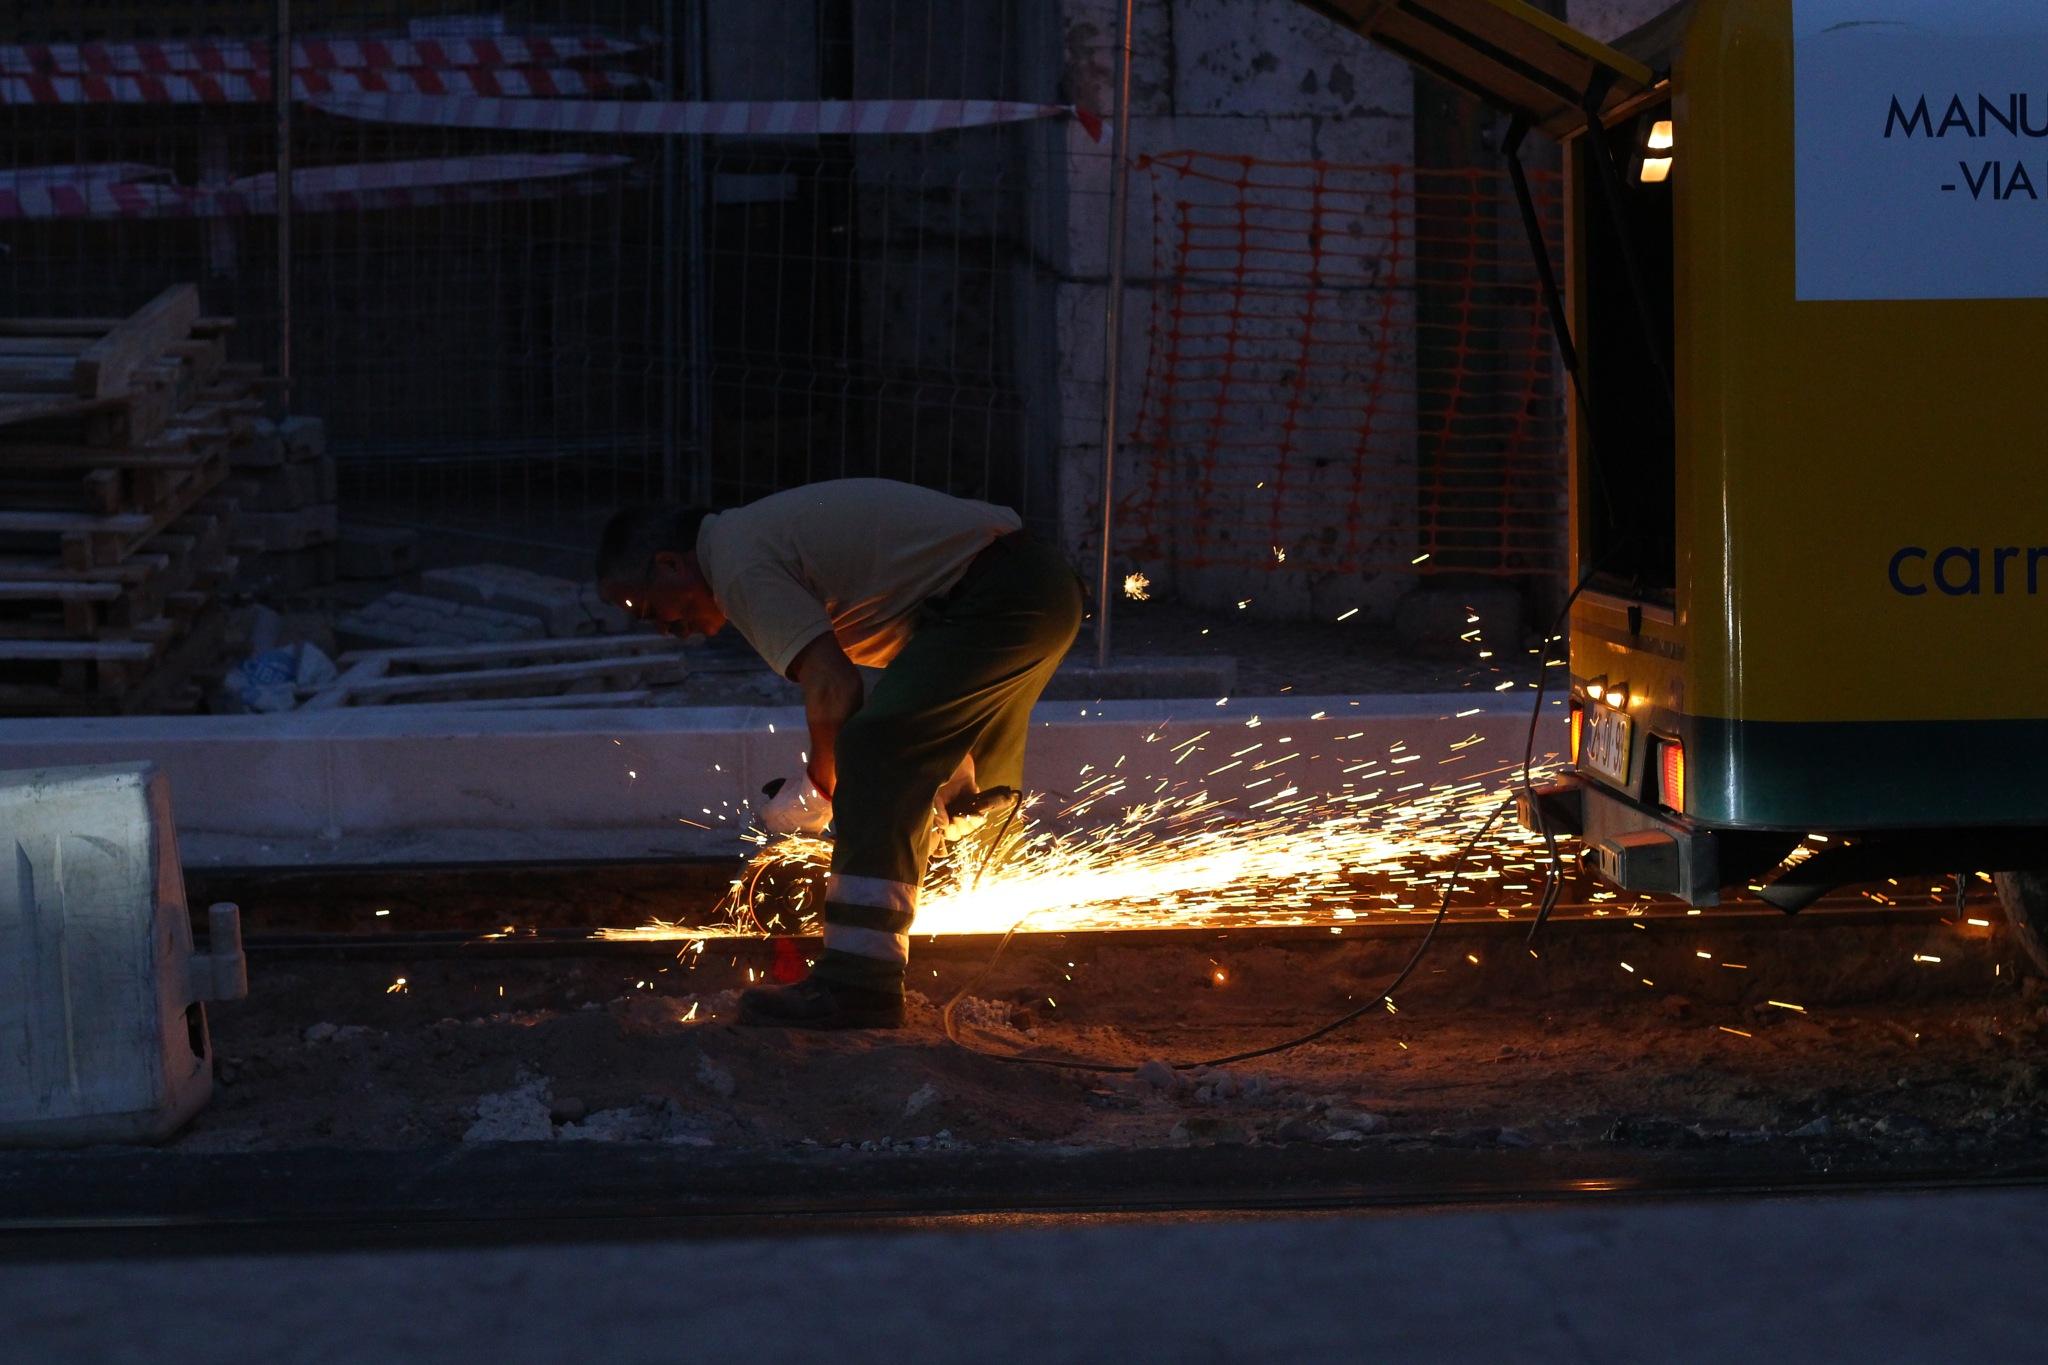 Rail work, Lx by carlosmsantos